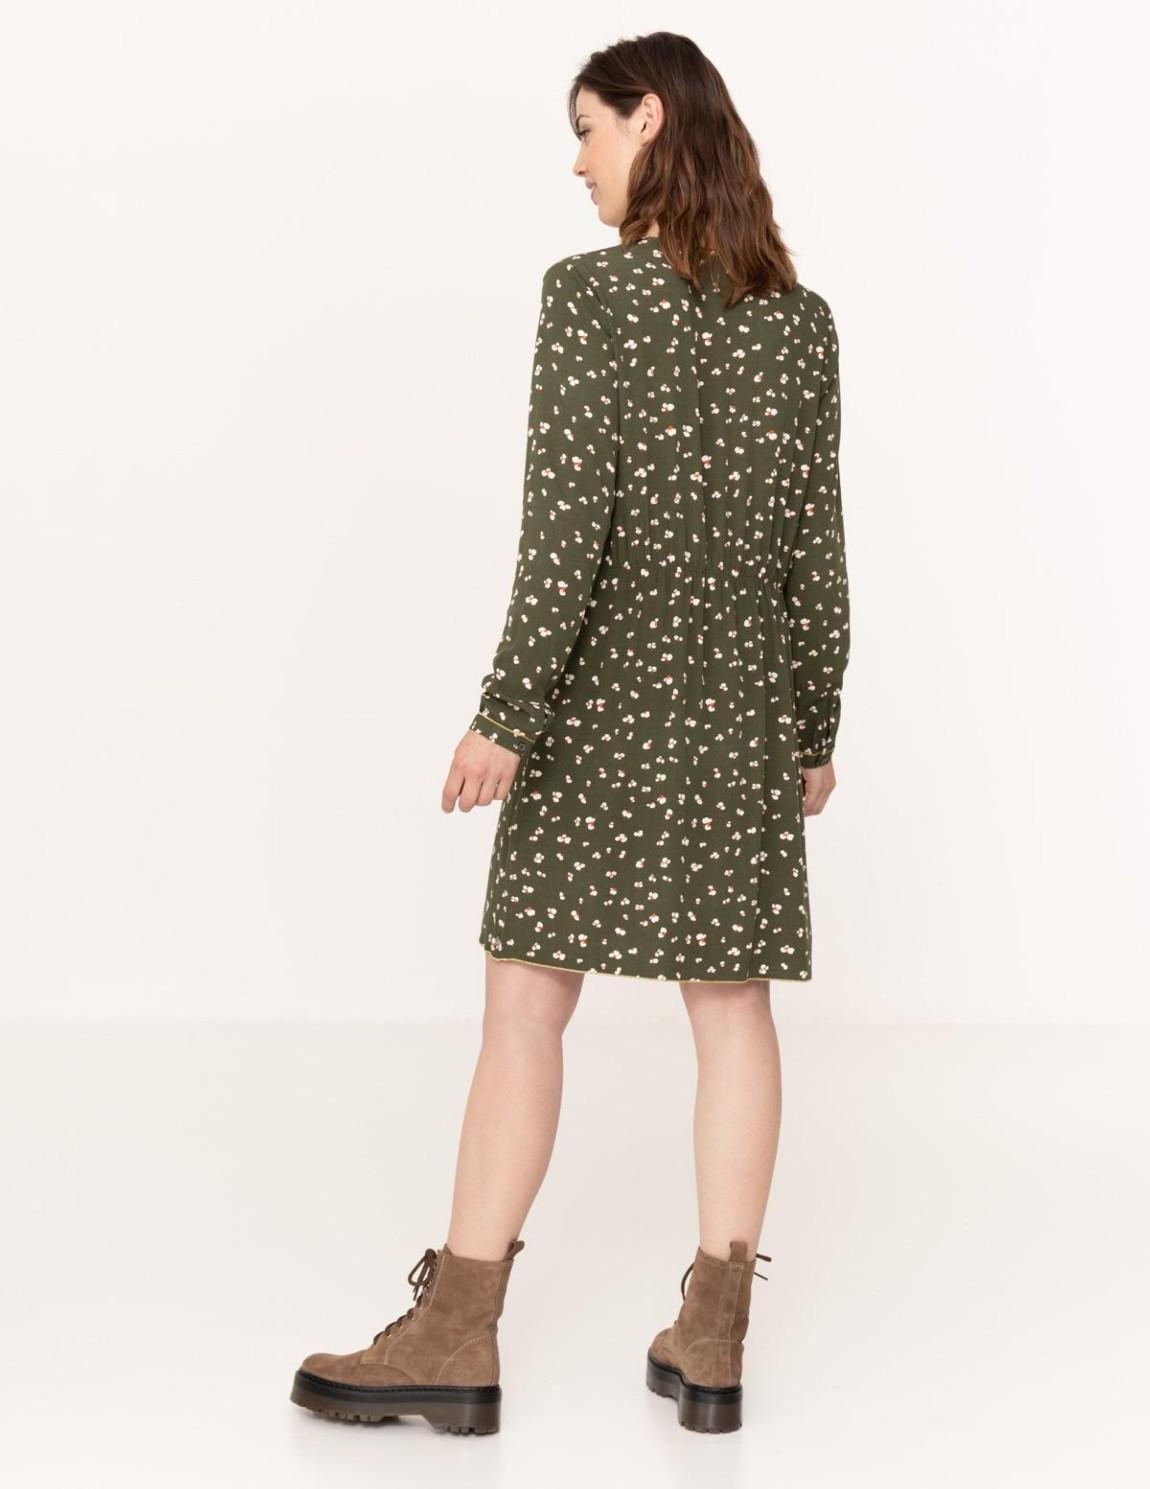 Vestido corto estampado - Ítem2